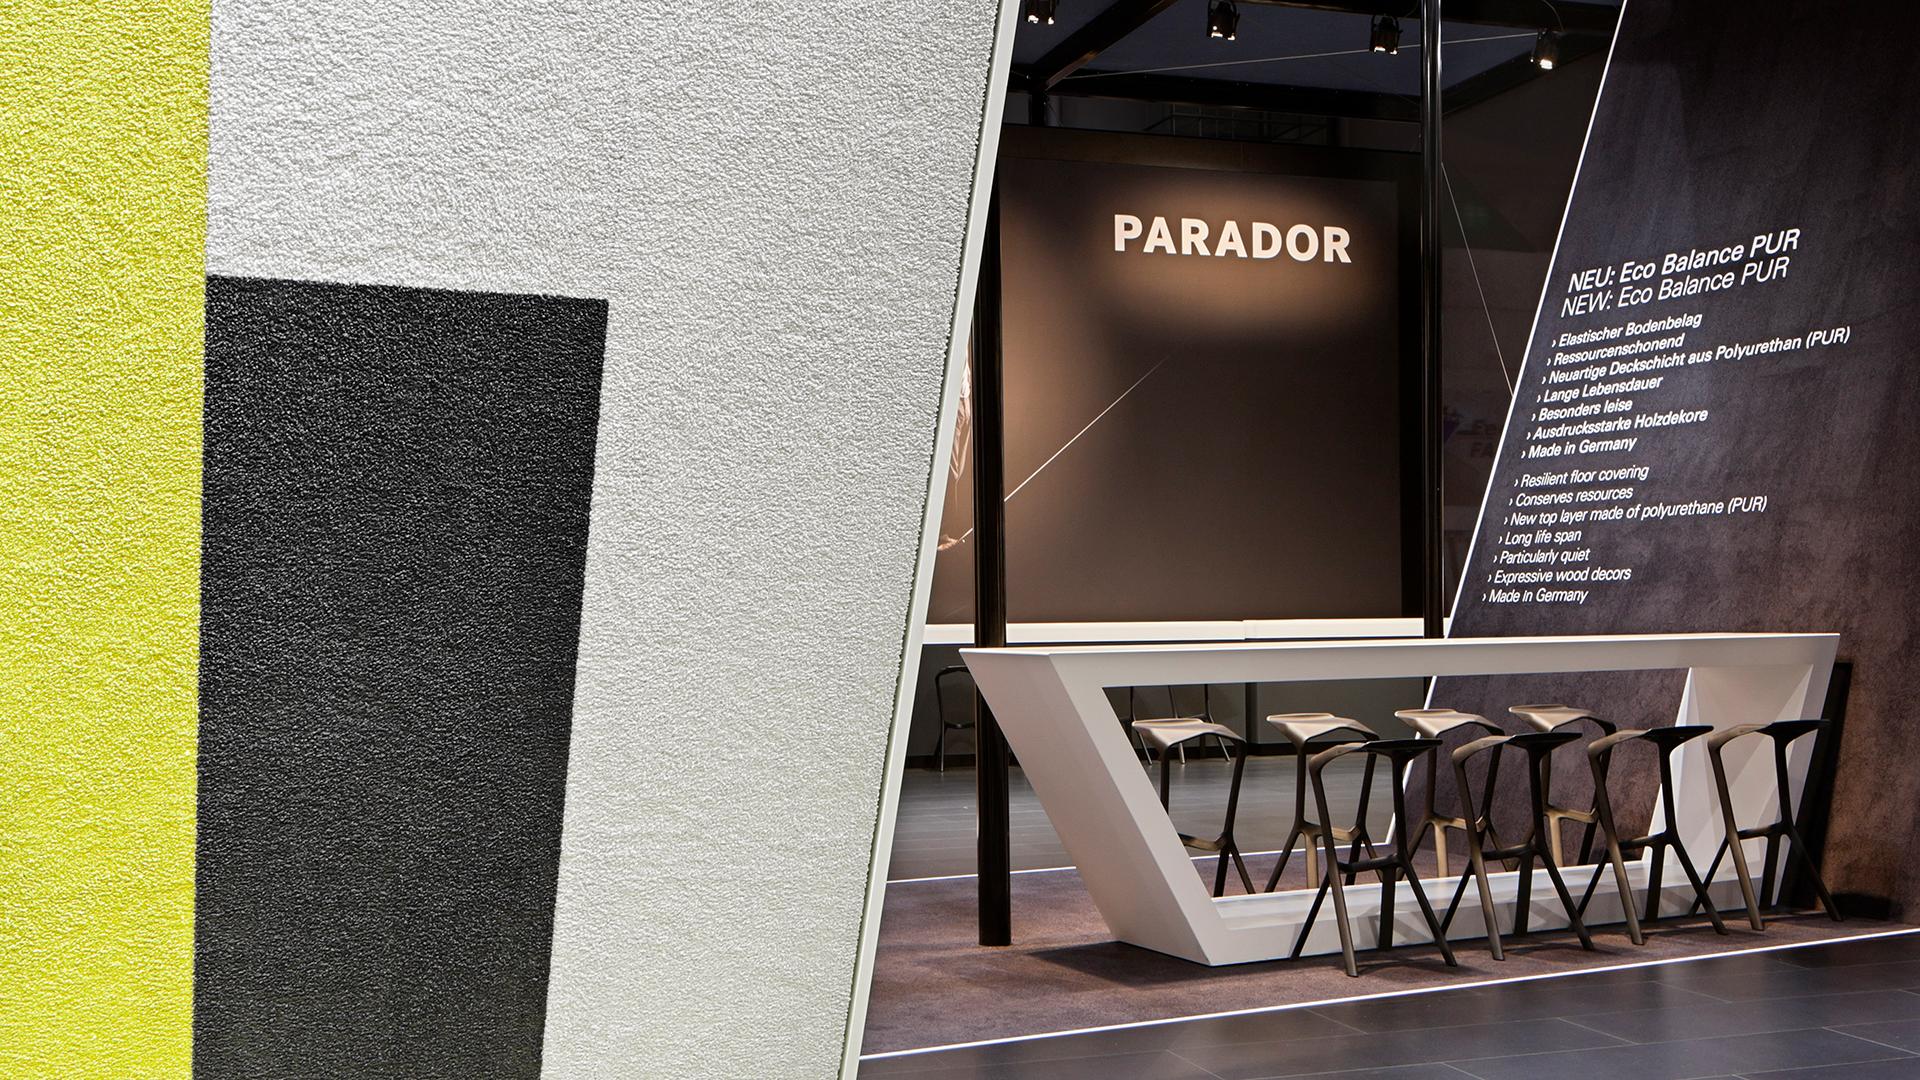 parador bodenbelge cheap image for parador sl lieferbar in verbindung mit parador bodenbelag. Black Bedroom Furniture Sets. Home Design Ideas